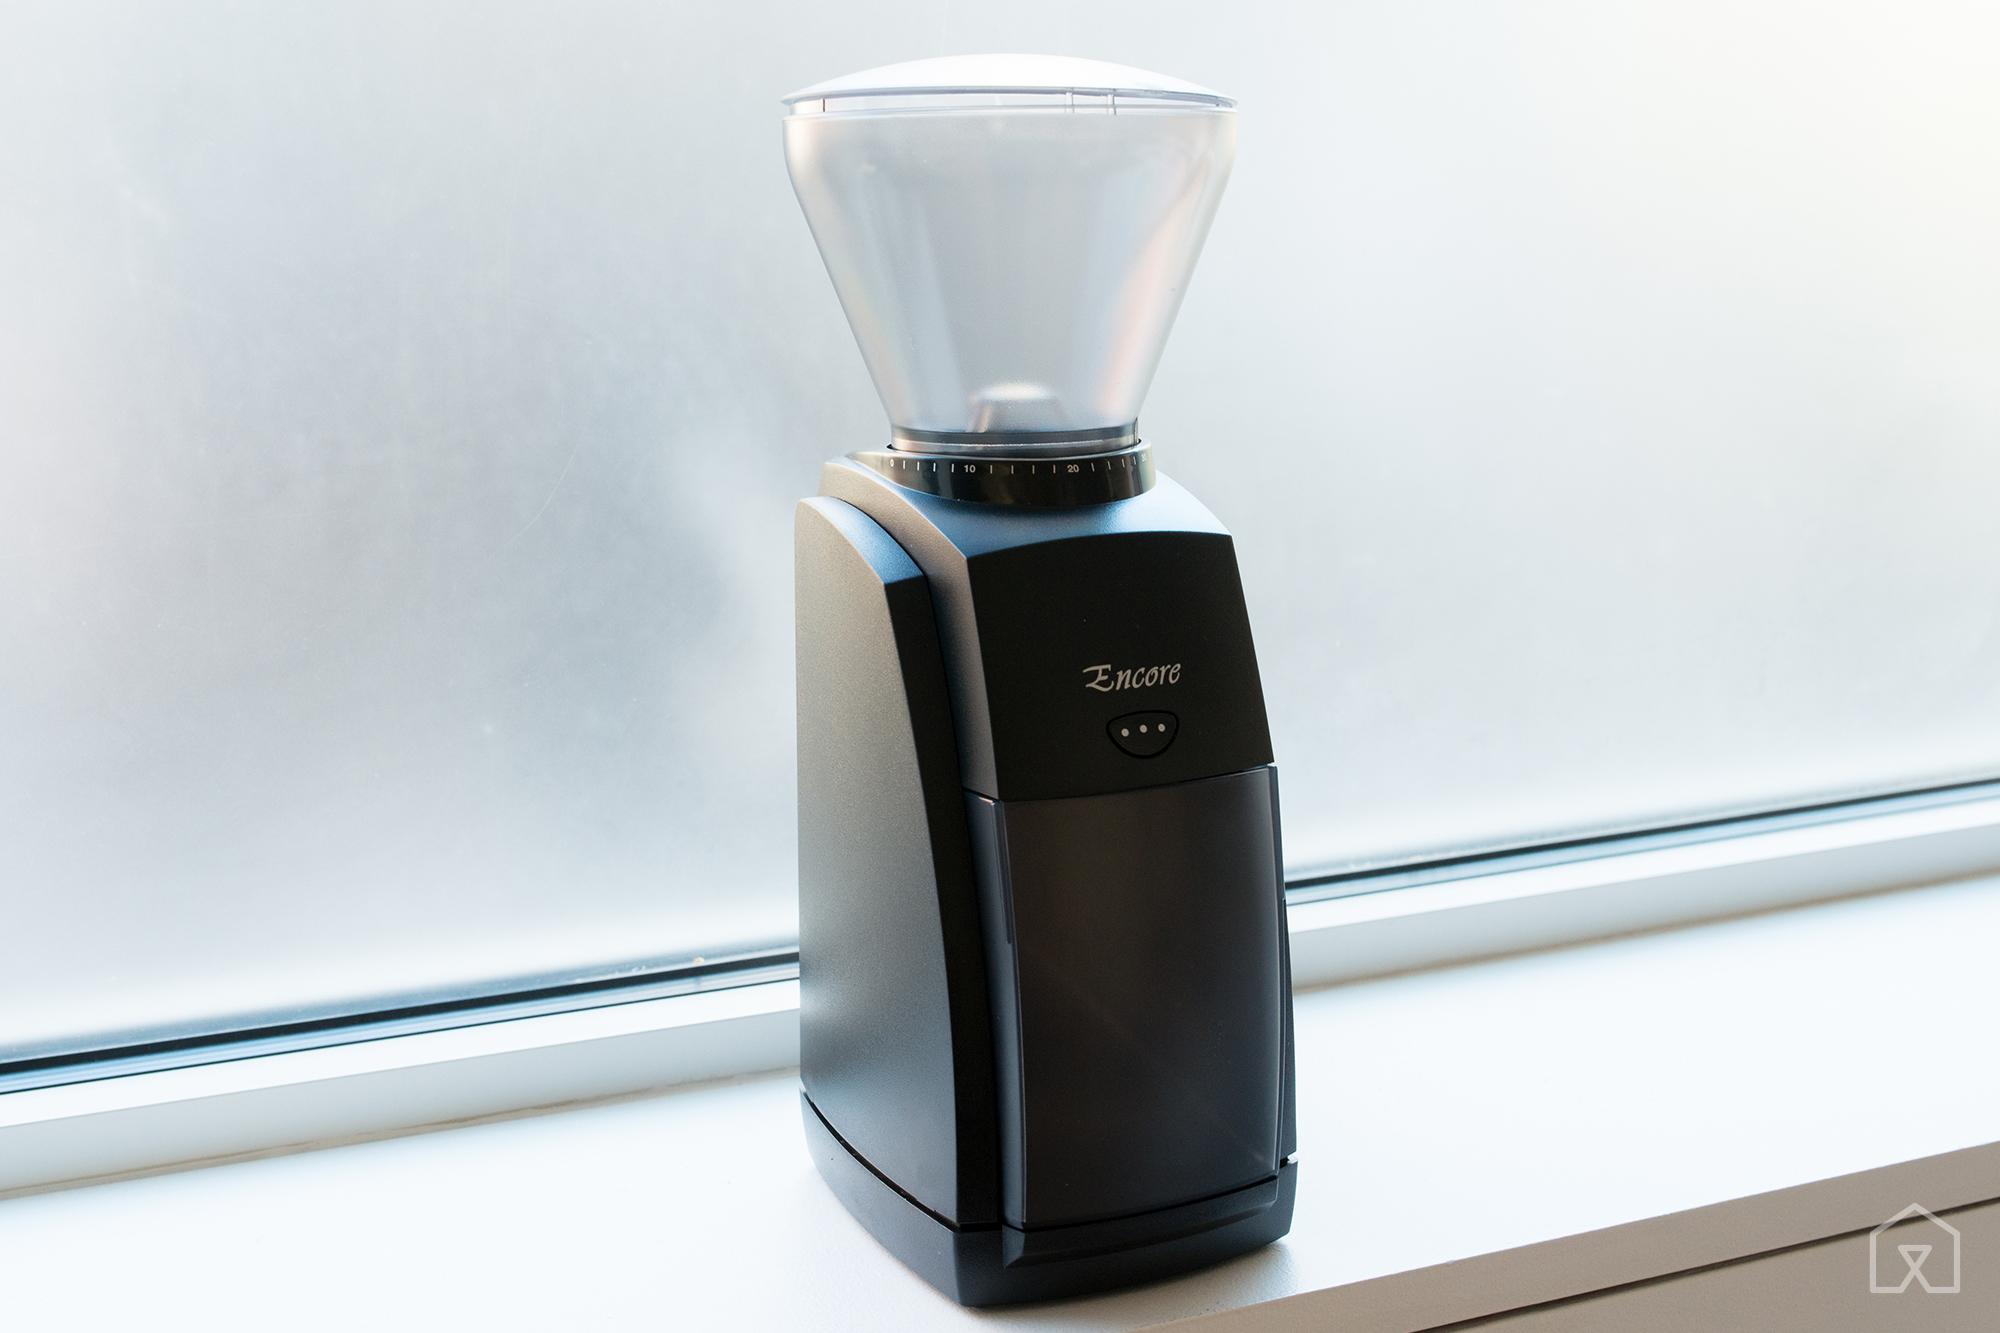 Best Coffee Grinder 2020 The best coffee grinder